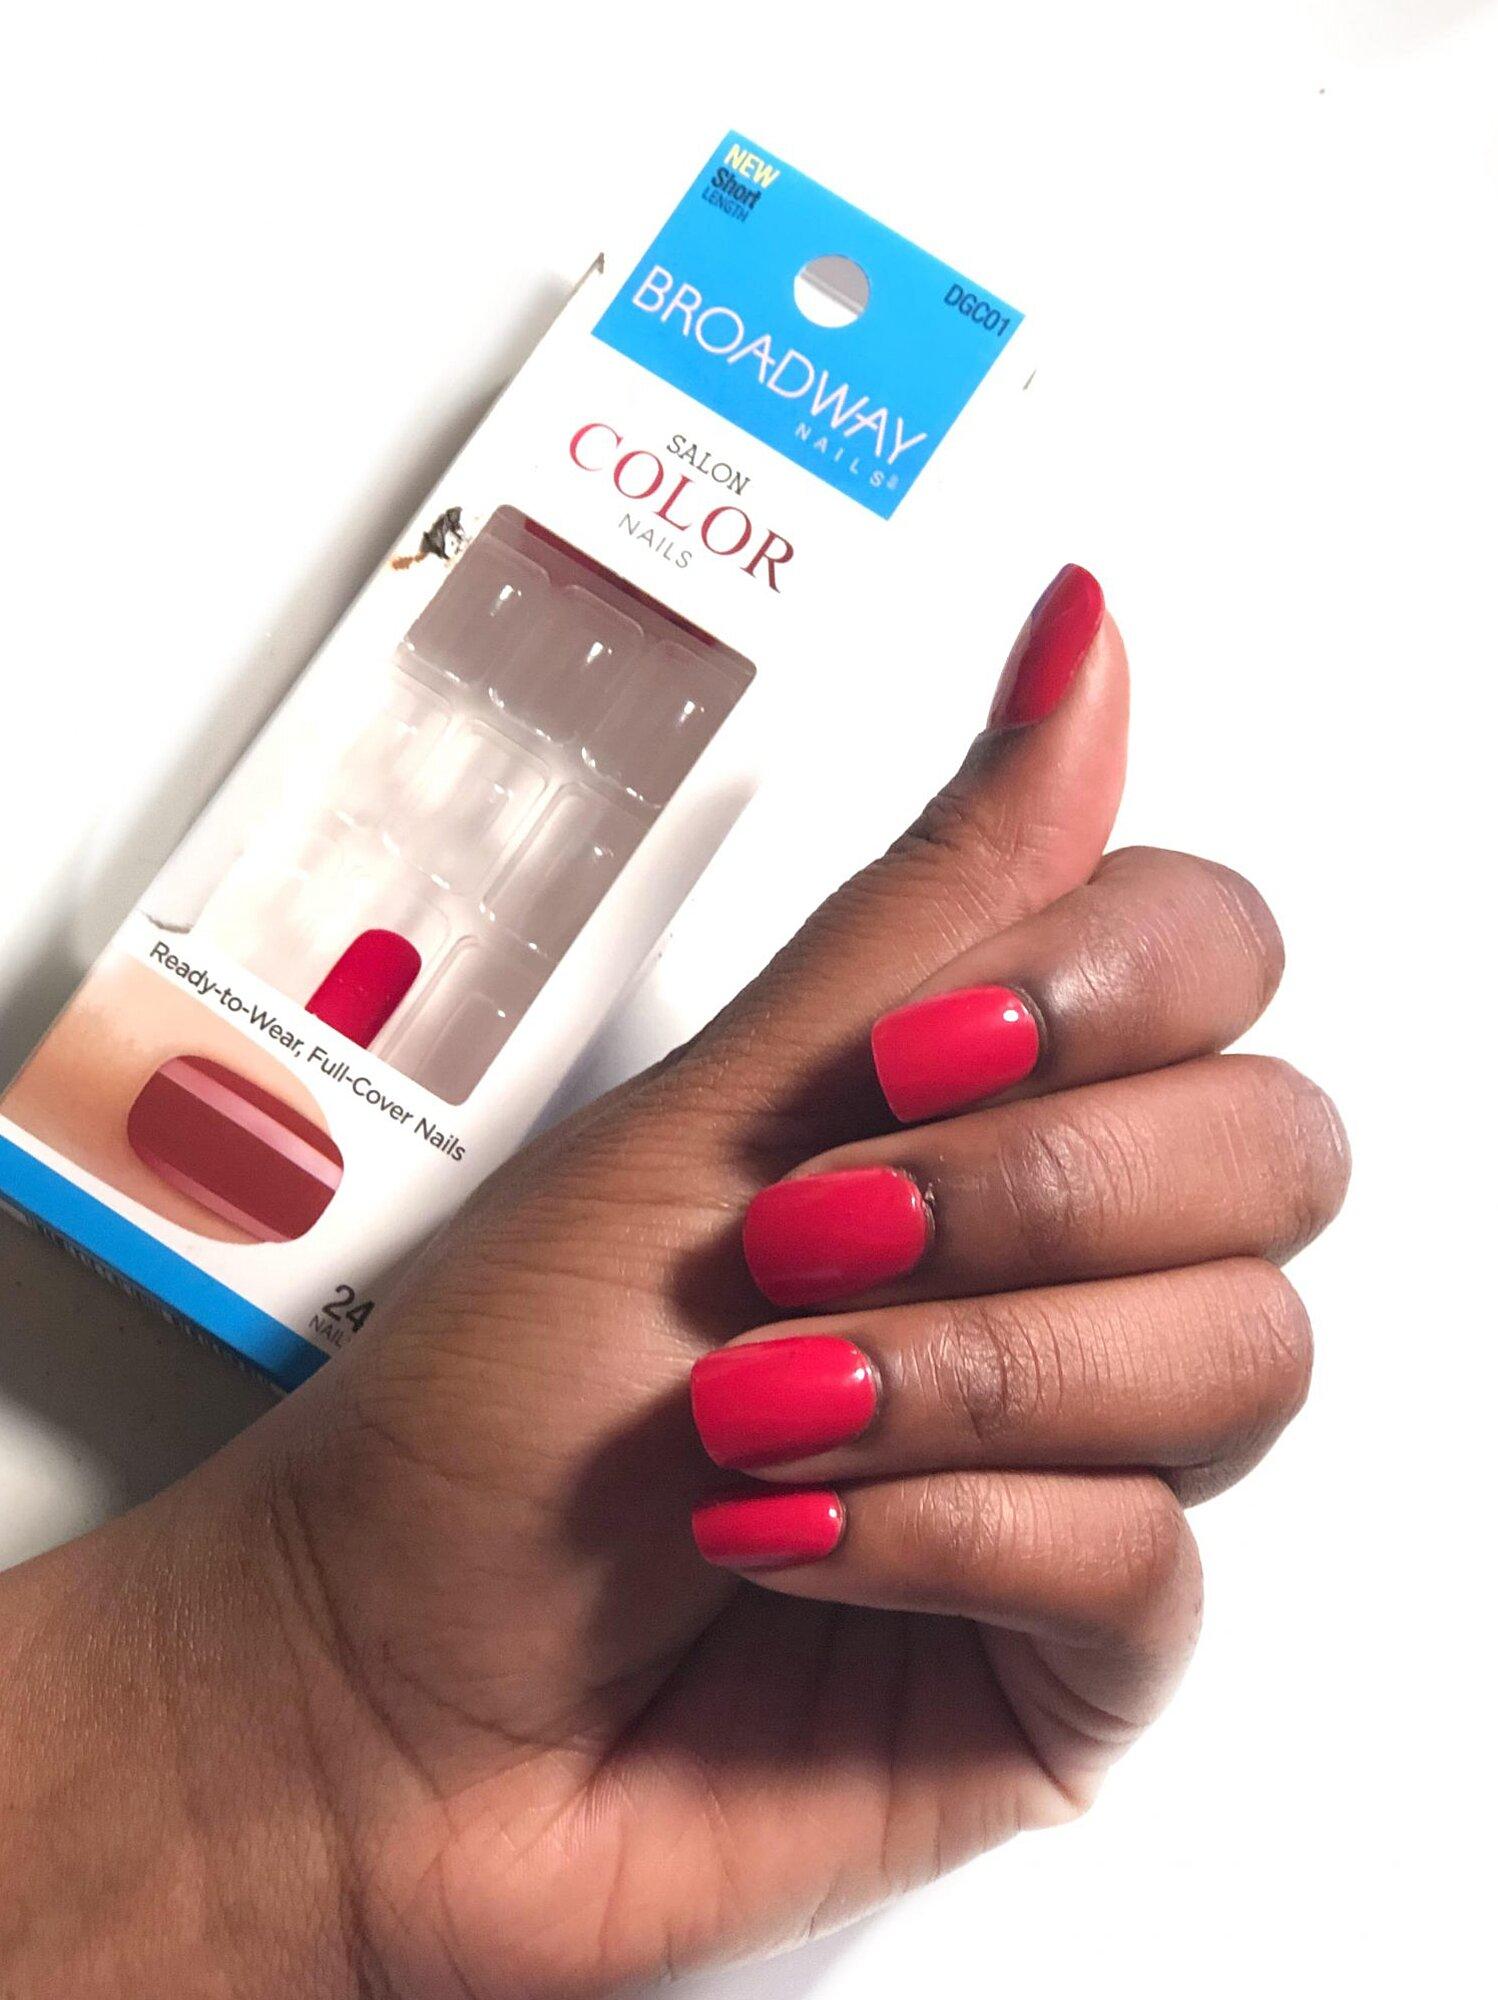 I Tried 1 Press On Nails And It Looks Like I Got A Fresh Gel Manicure Hellogiggles